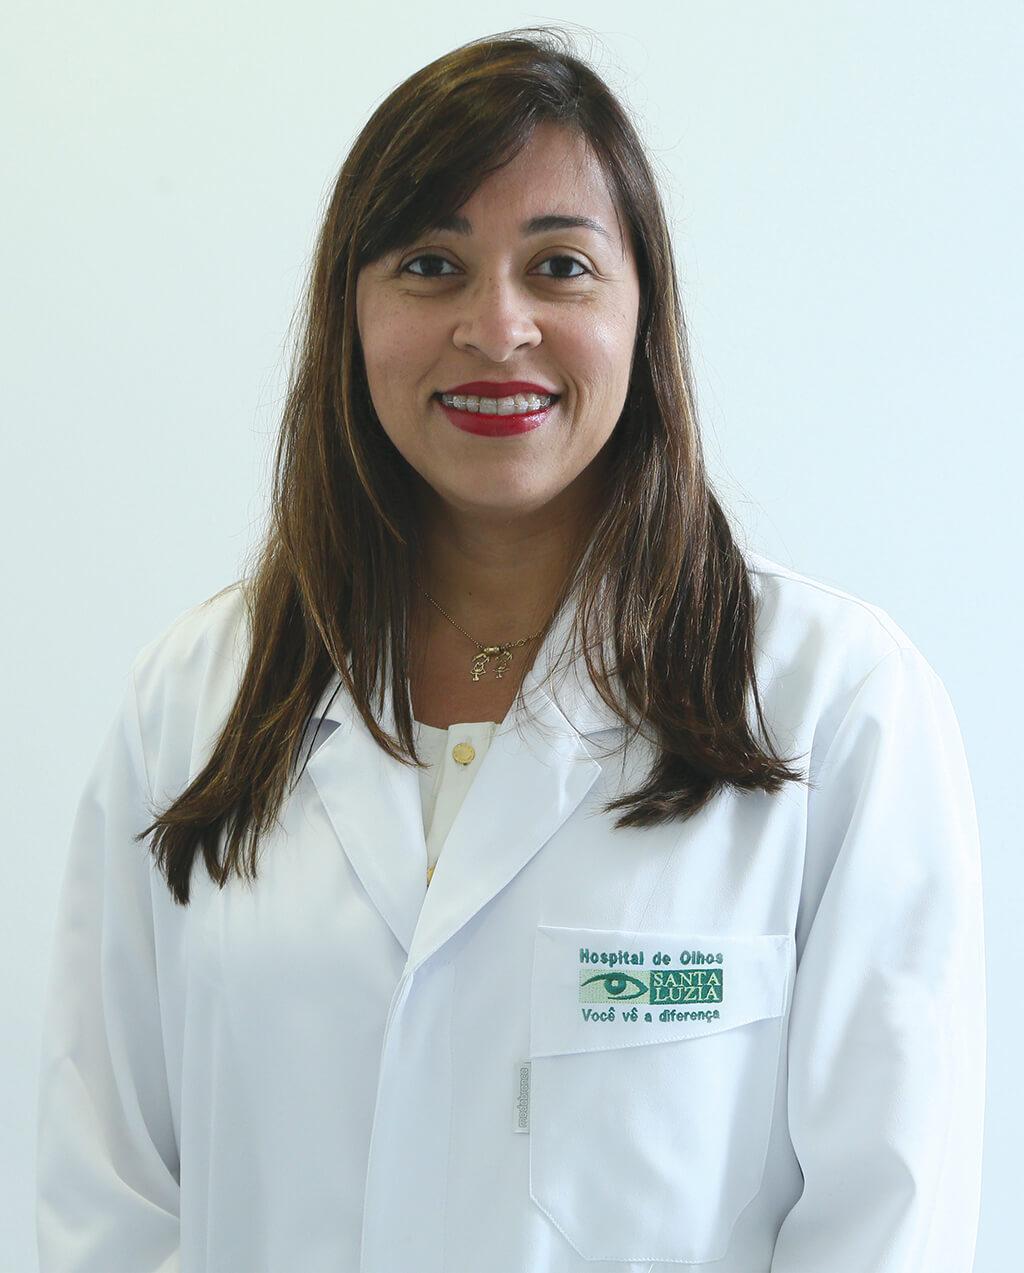 Mirelle Souza Leão (CRM 14677)